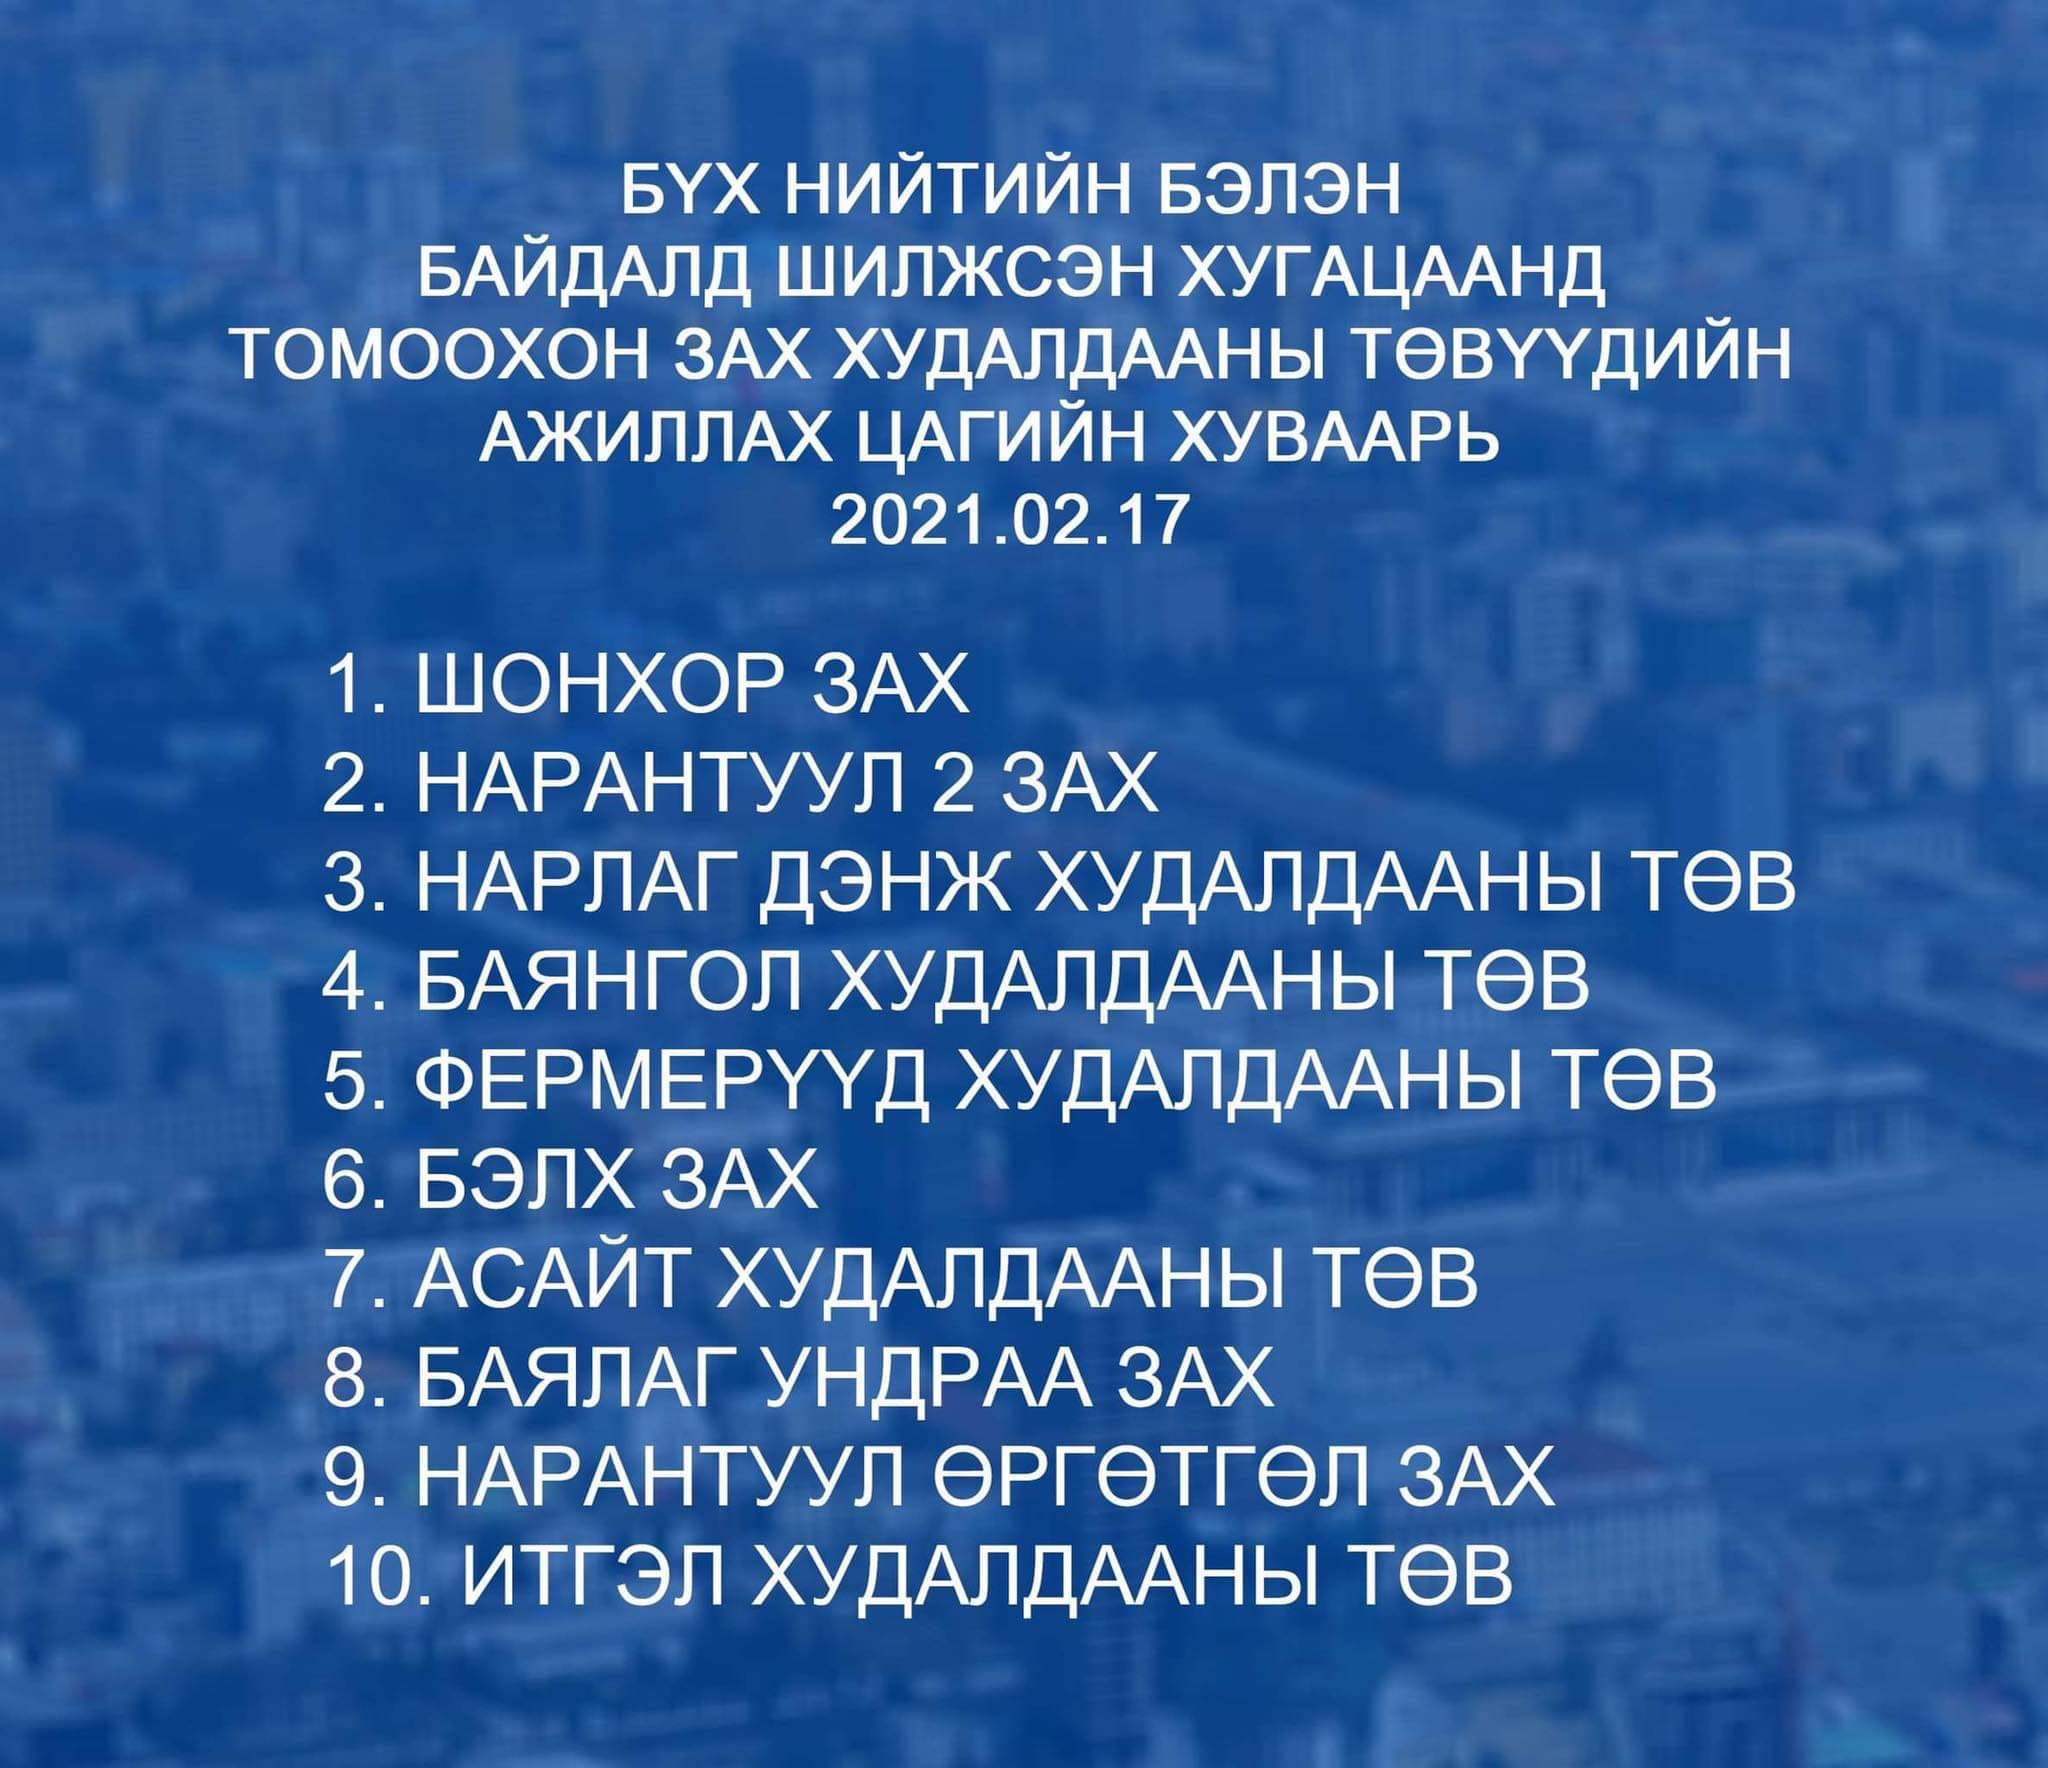 149324578_1000788603783720_3515193854675883654_n